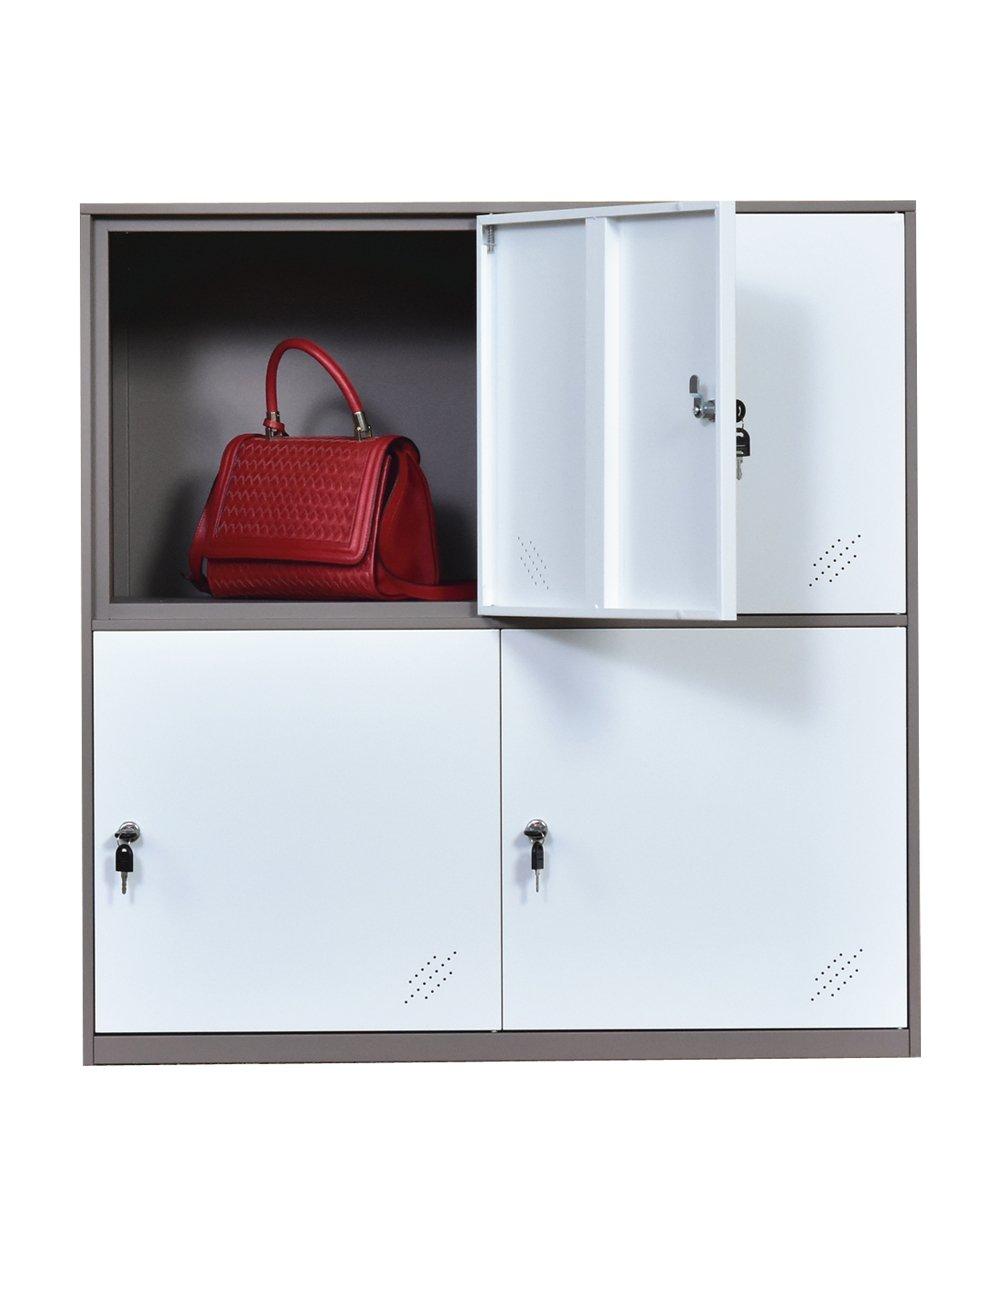 Metal 9 Door Cabinet Locker with Key Lock Using for Shool Office and Kids Room (4D)